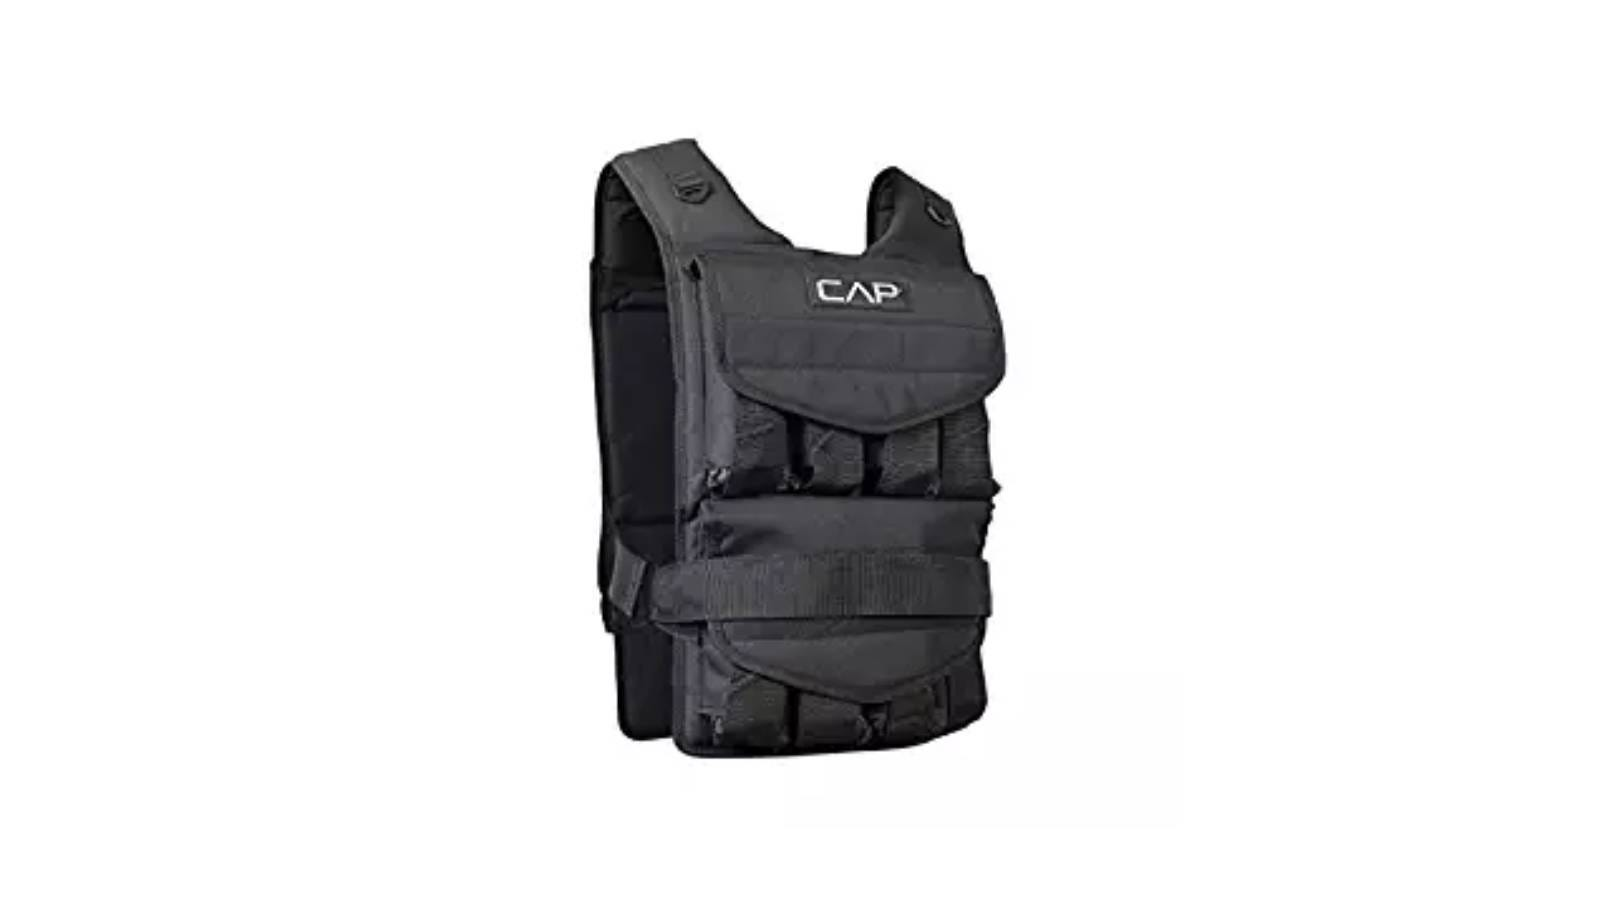 Cap Adjustble Weighted Vest